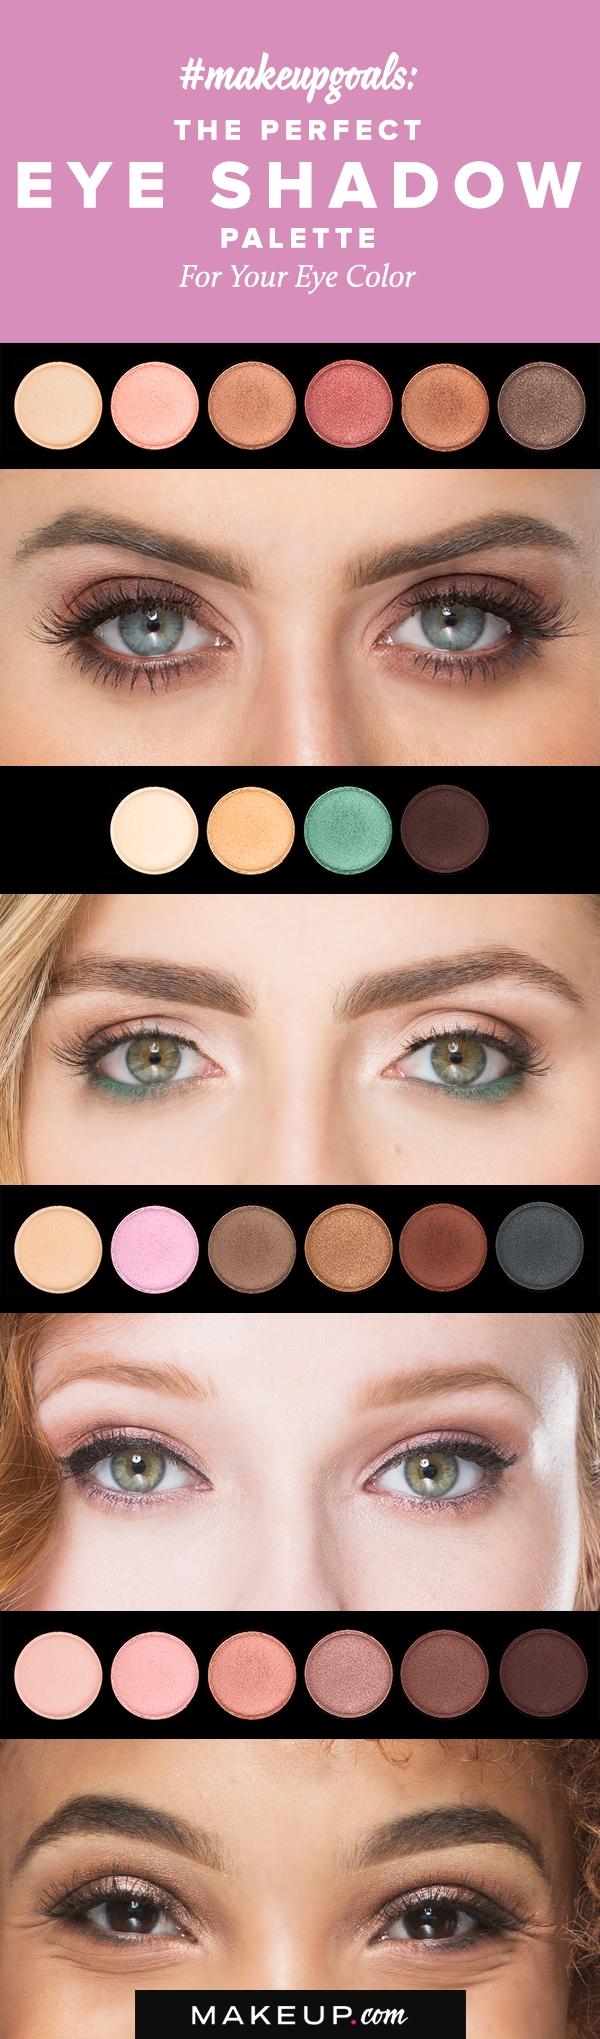 best color eyeshadow for hazel green eyes - wavy haircut